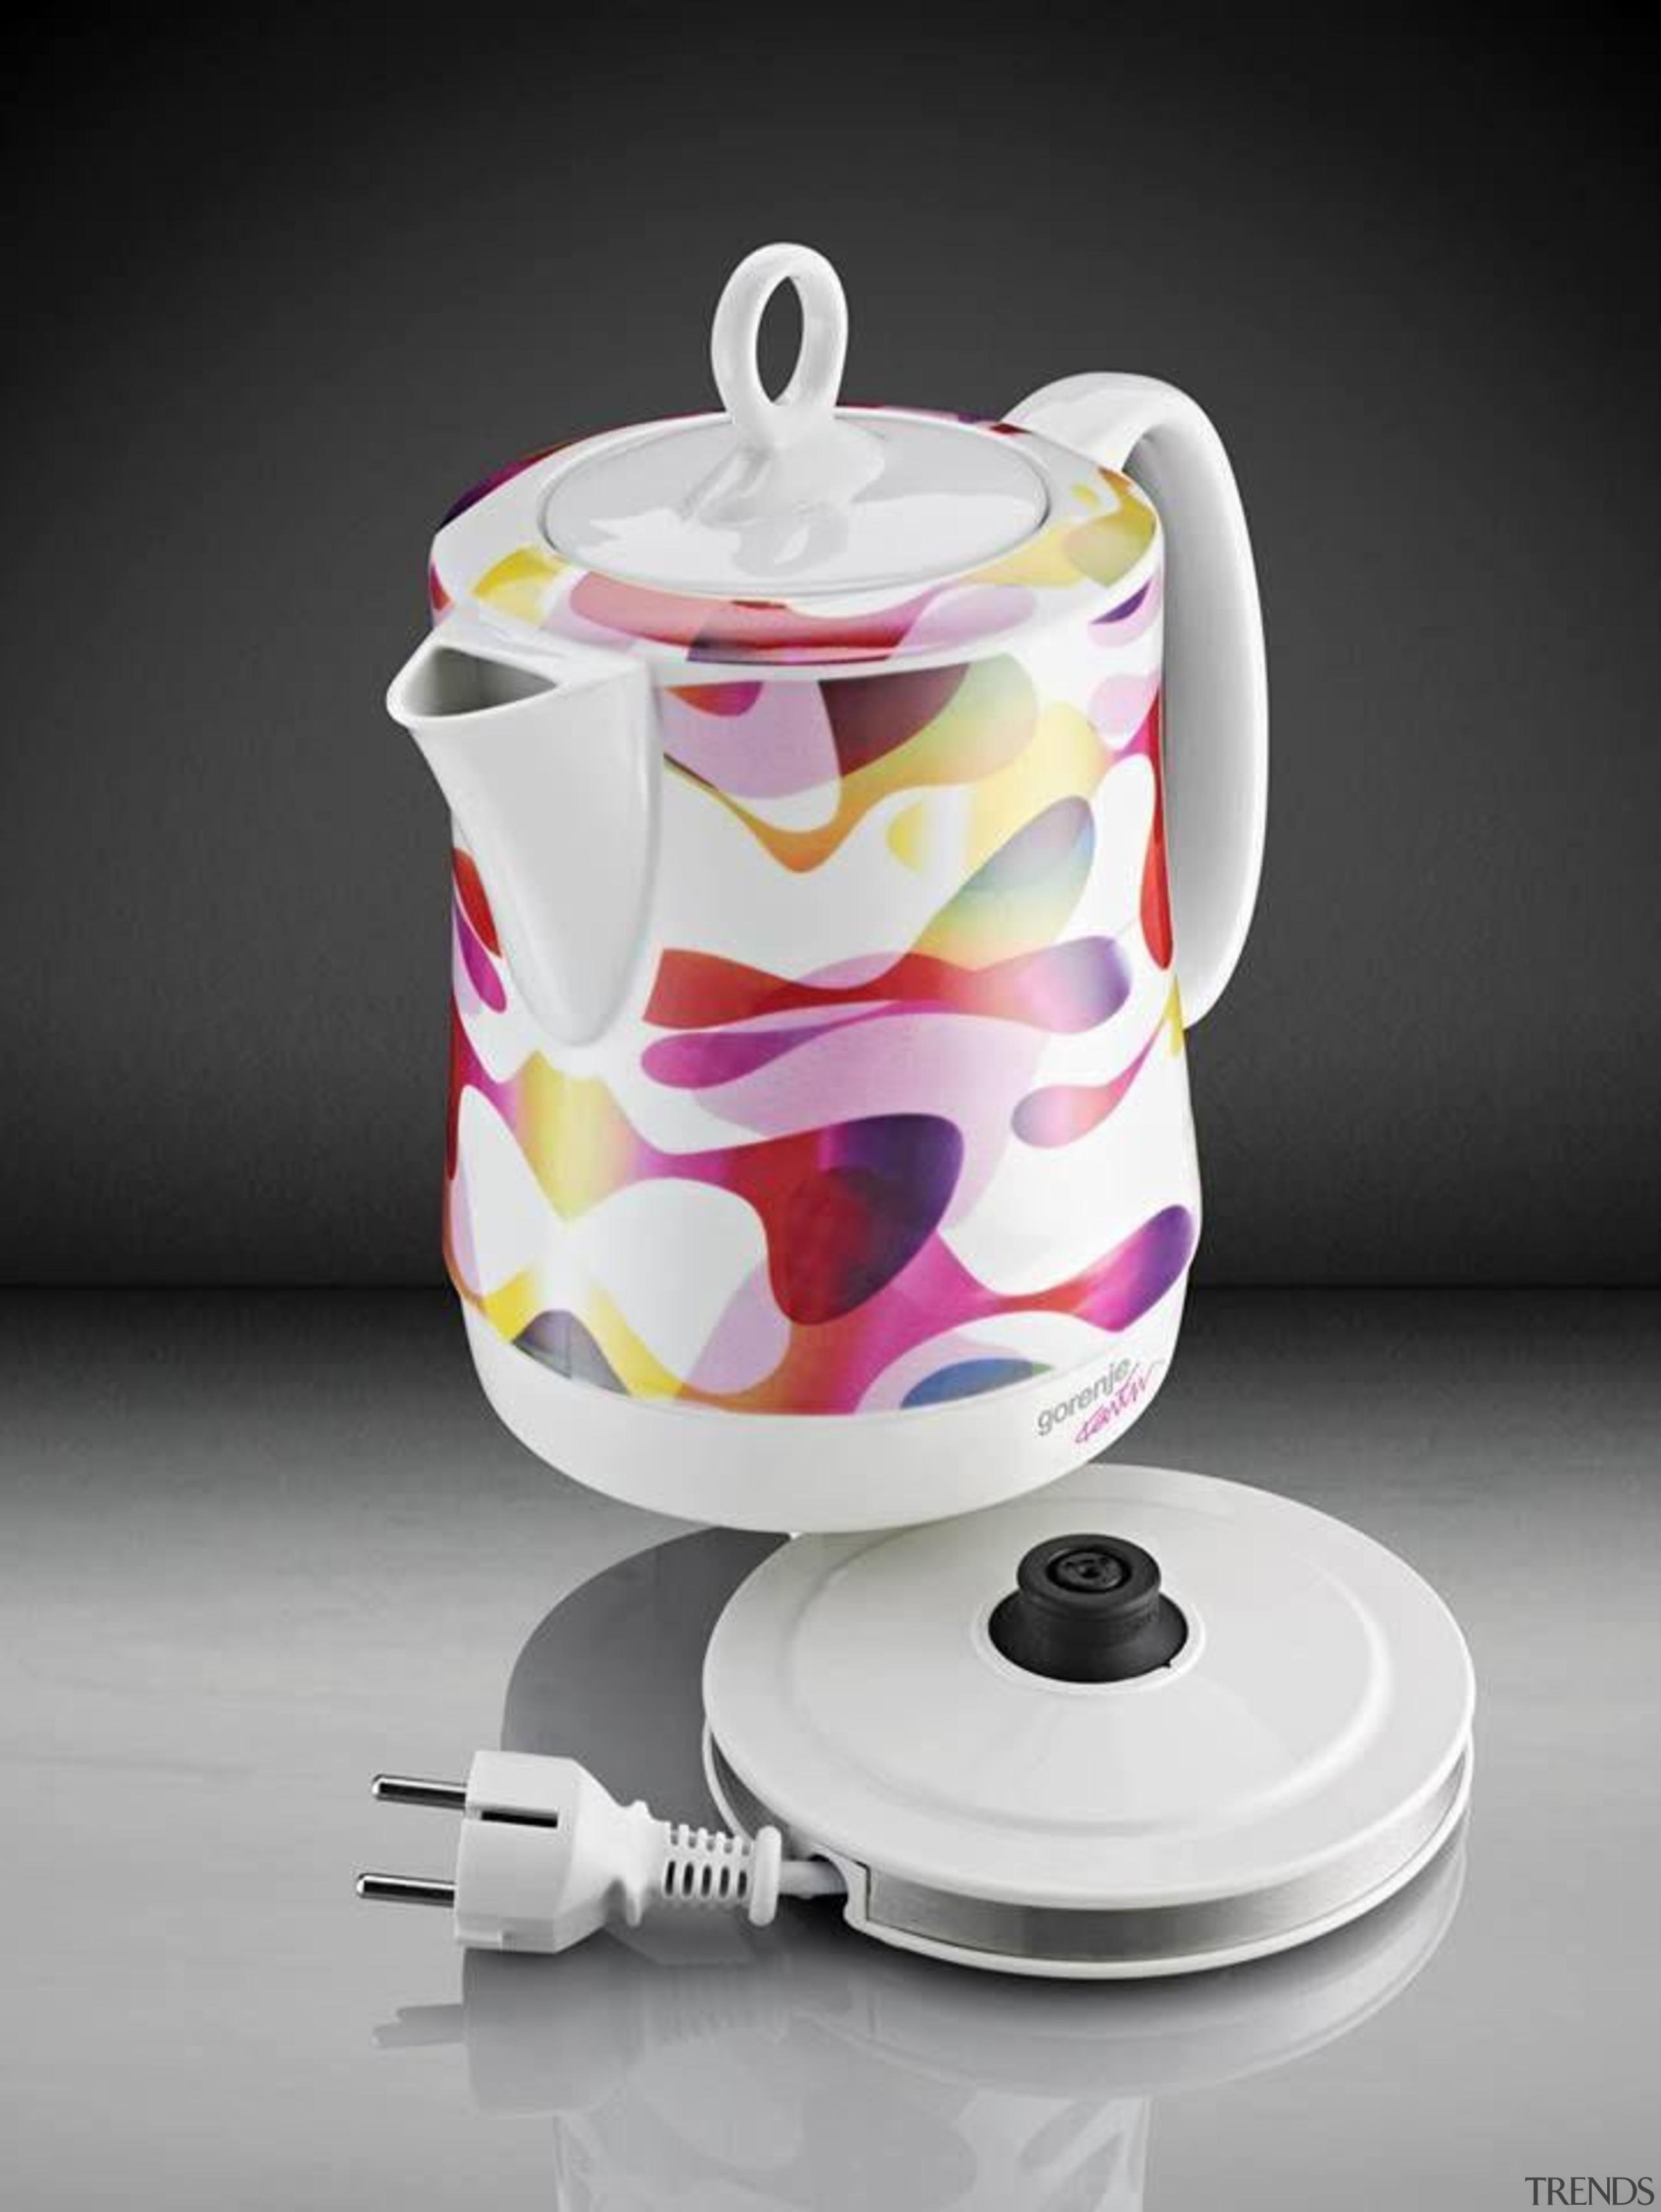 Kitchen Appliances designed by Karim Rashid - Watter ceramic, coffee cup, cup, kettle, porcelain, product, product design, serveware, tableware, teapot, gray, black